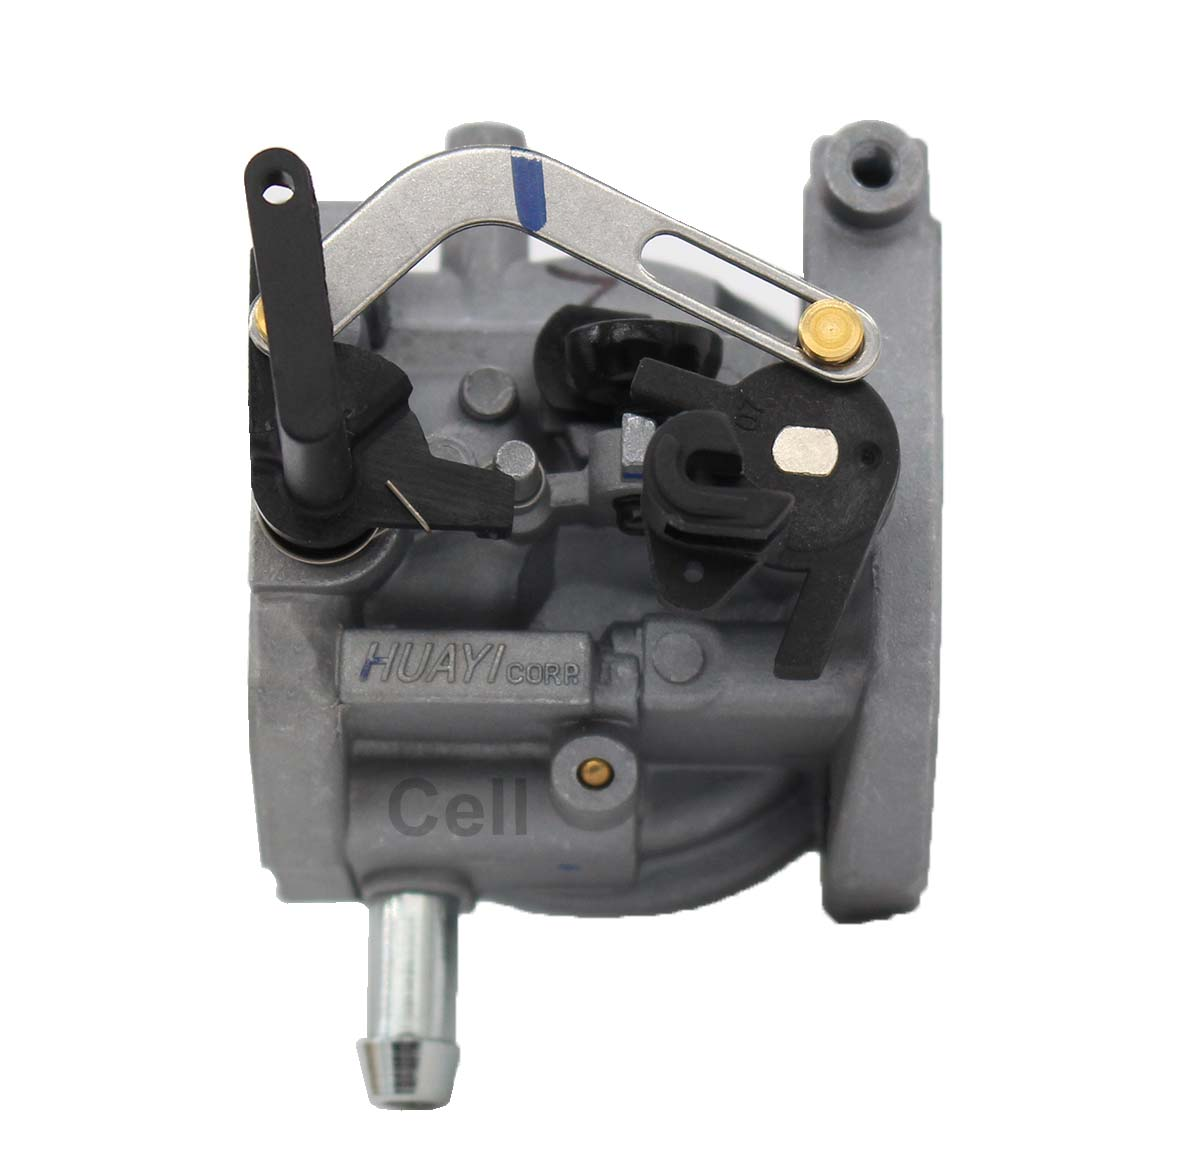 Carburetor For Kohler Xt650 Xt675 Toro Husqvarna Mtd Auto Choke Carb Stihl Chainsaw Parts Diagram Besides Fs 55 14 853 68s